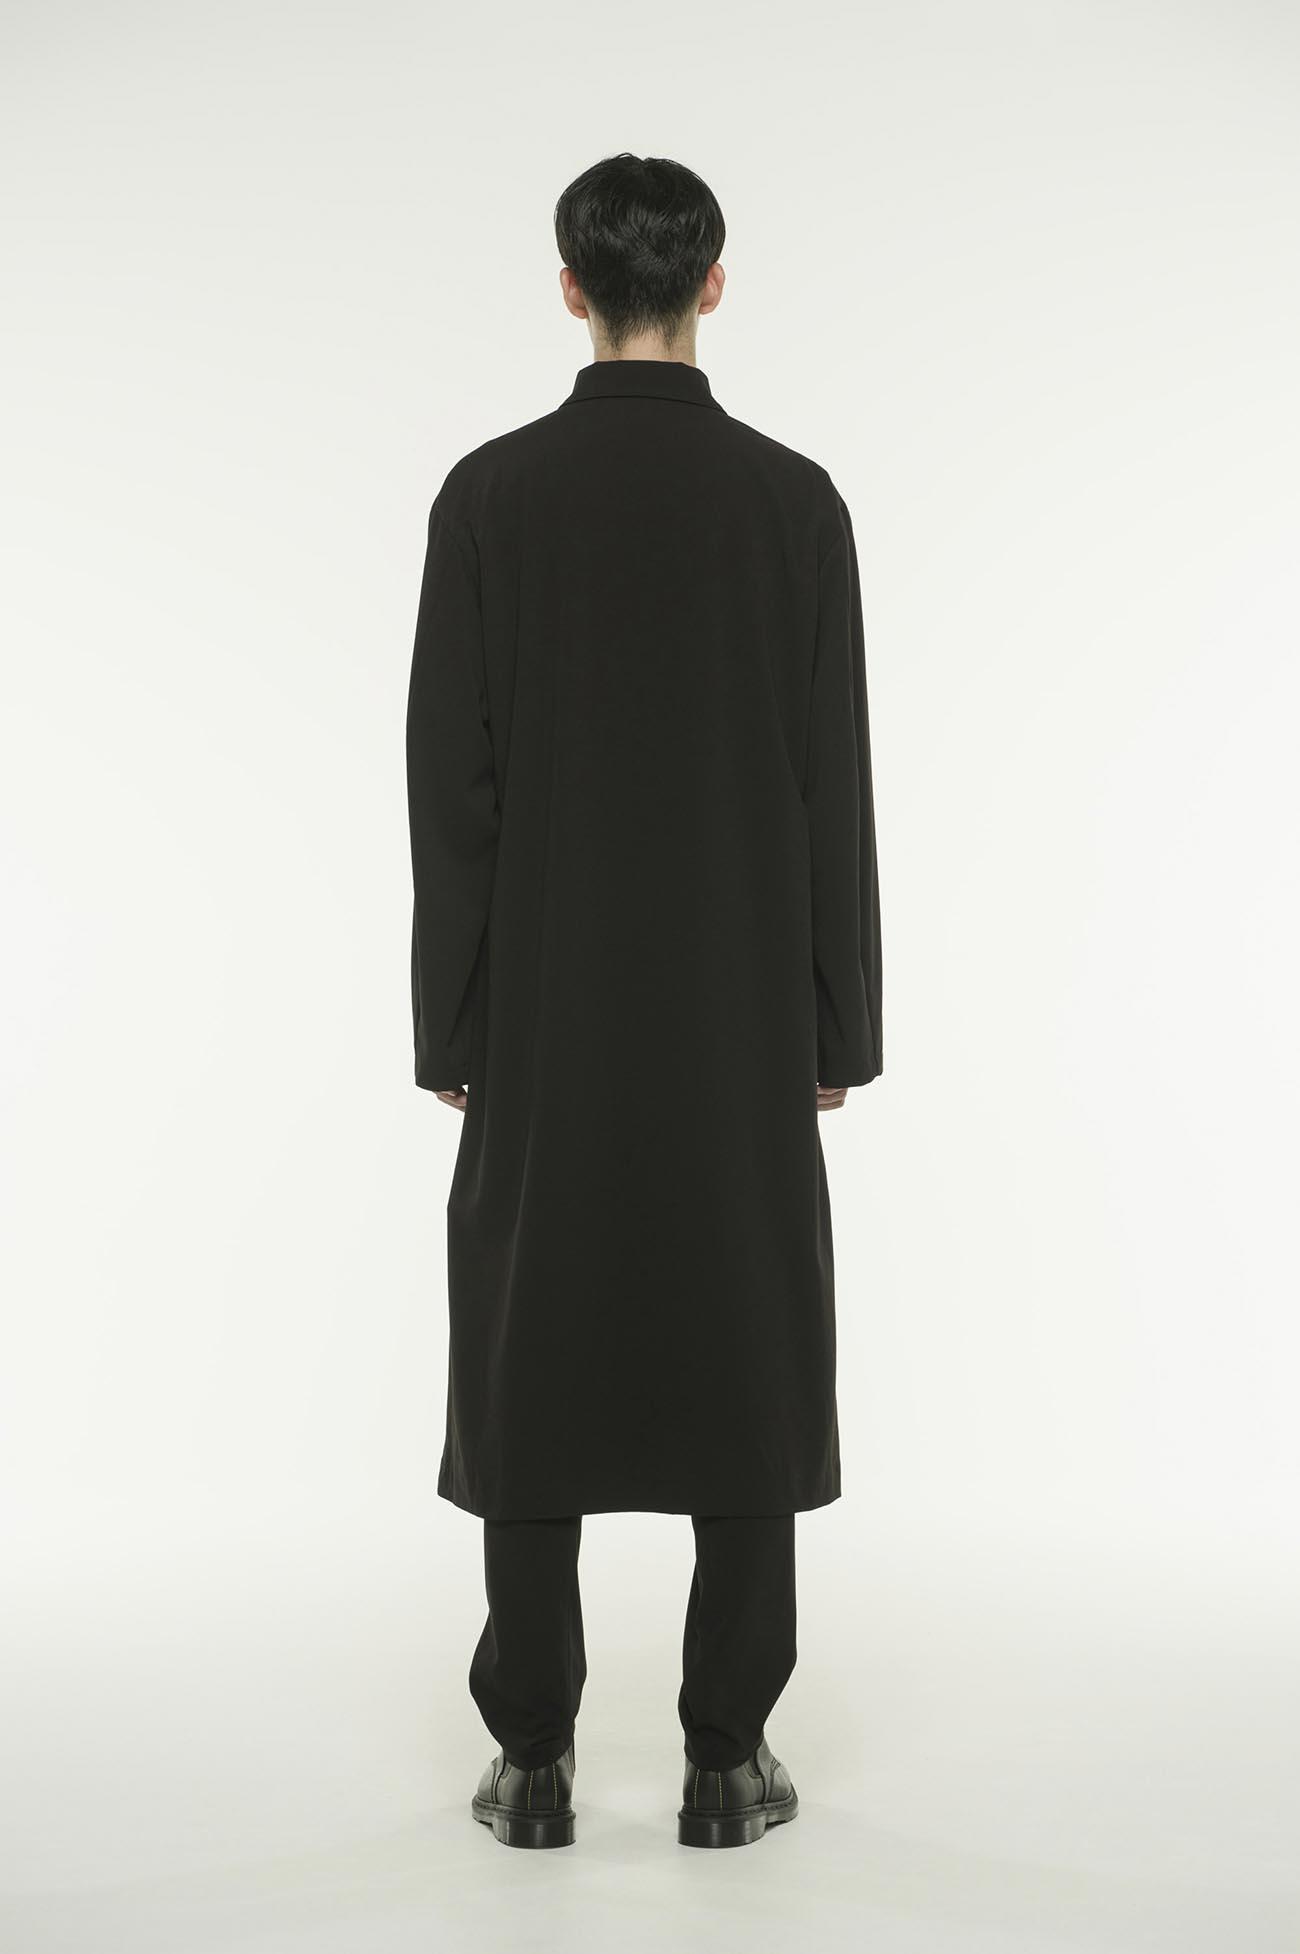 Pe/Rayon Gabardine Stretc Zipper Dress Coat